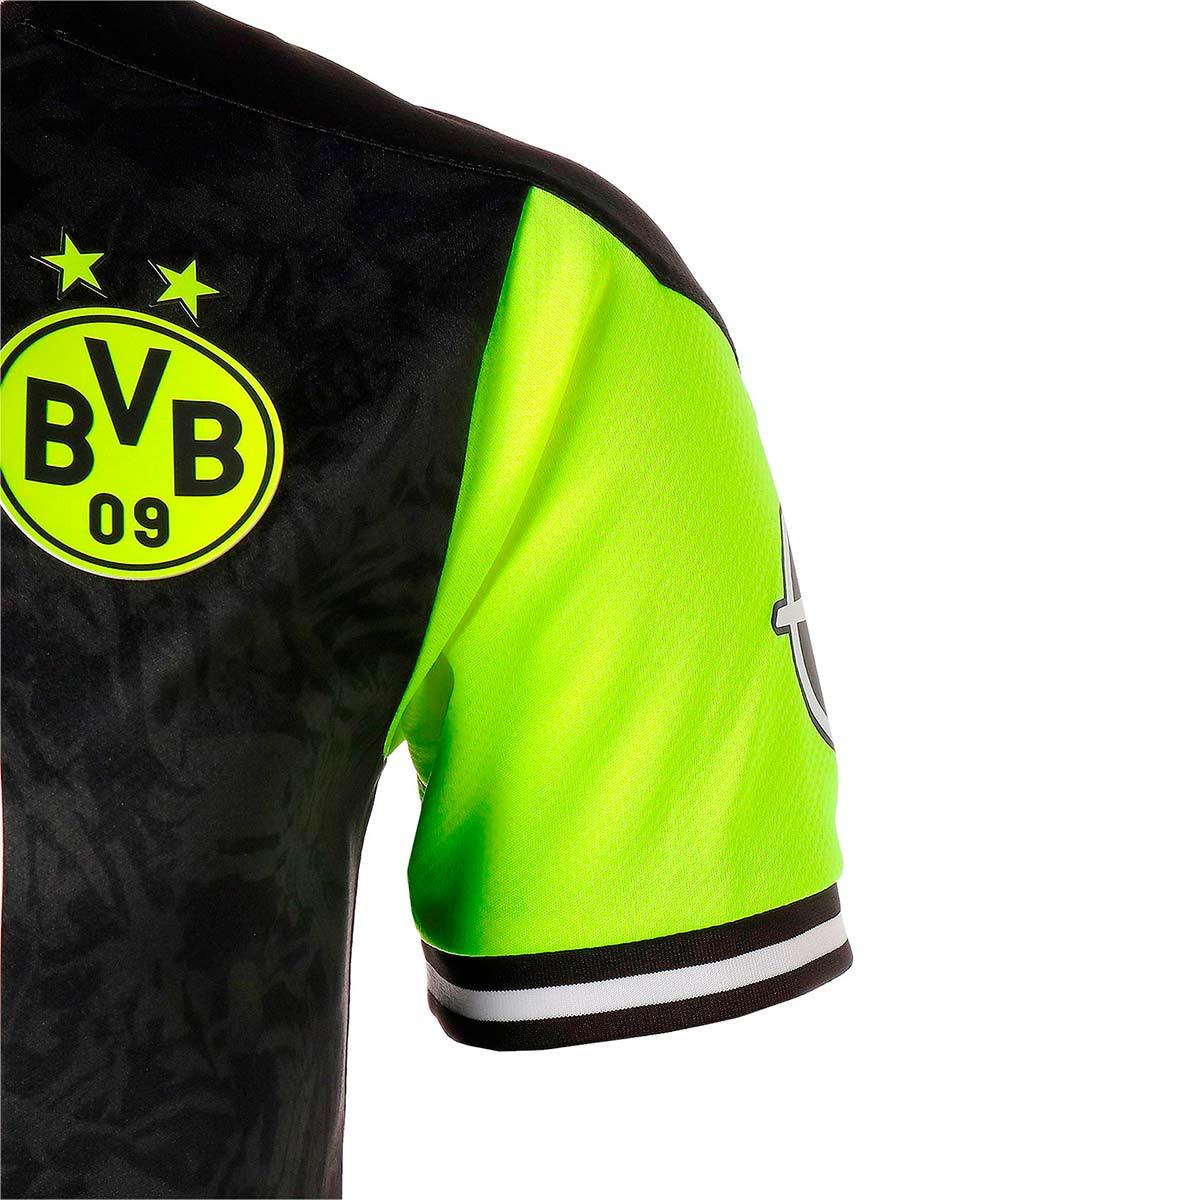 Maglia Puma BVB Borussia Dortmund Special Edition Jersey